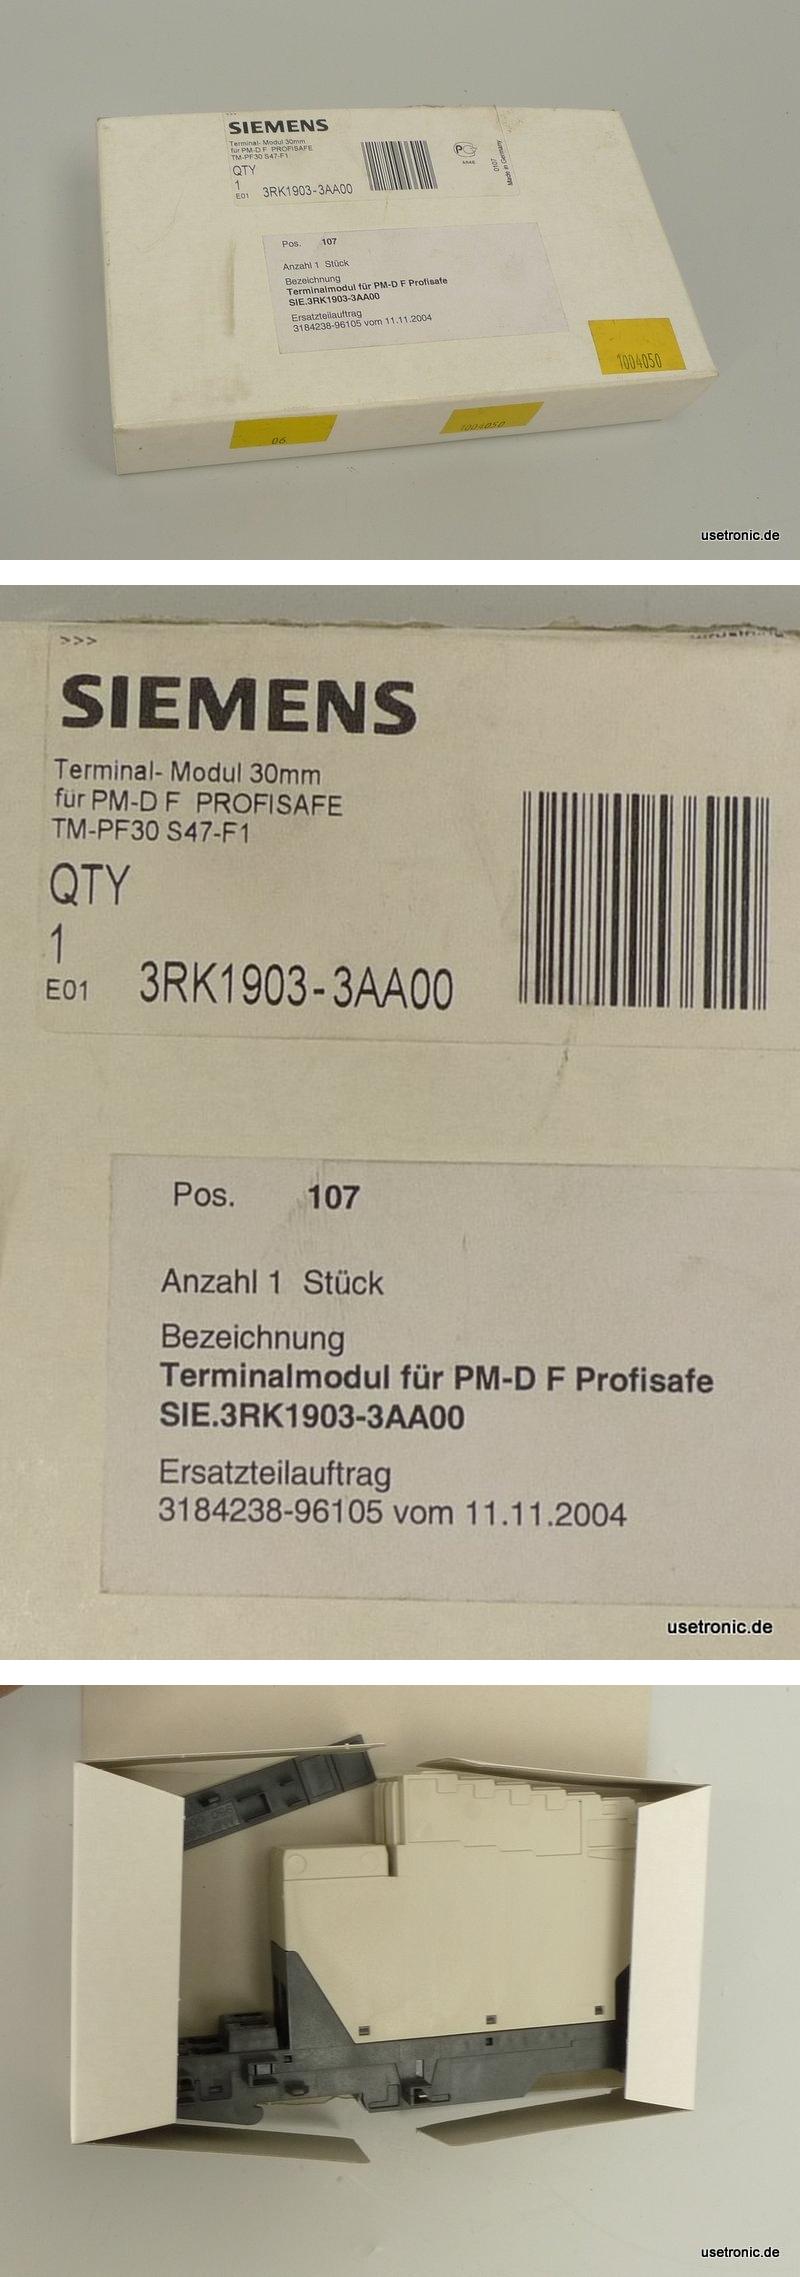 W573 Siemens Terminalmodul 30mm 3RK1903-3AA00 4011209536920